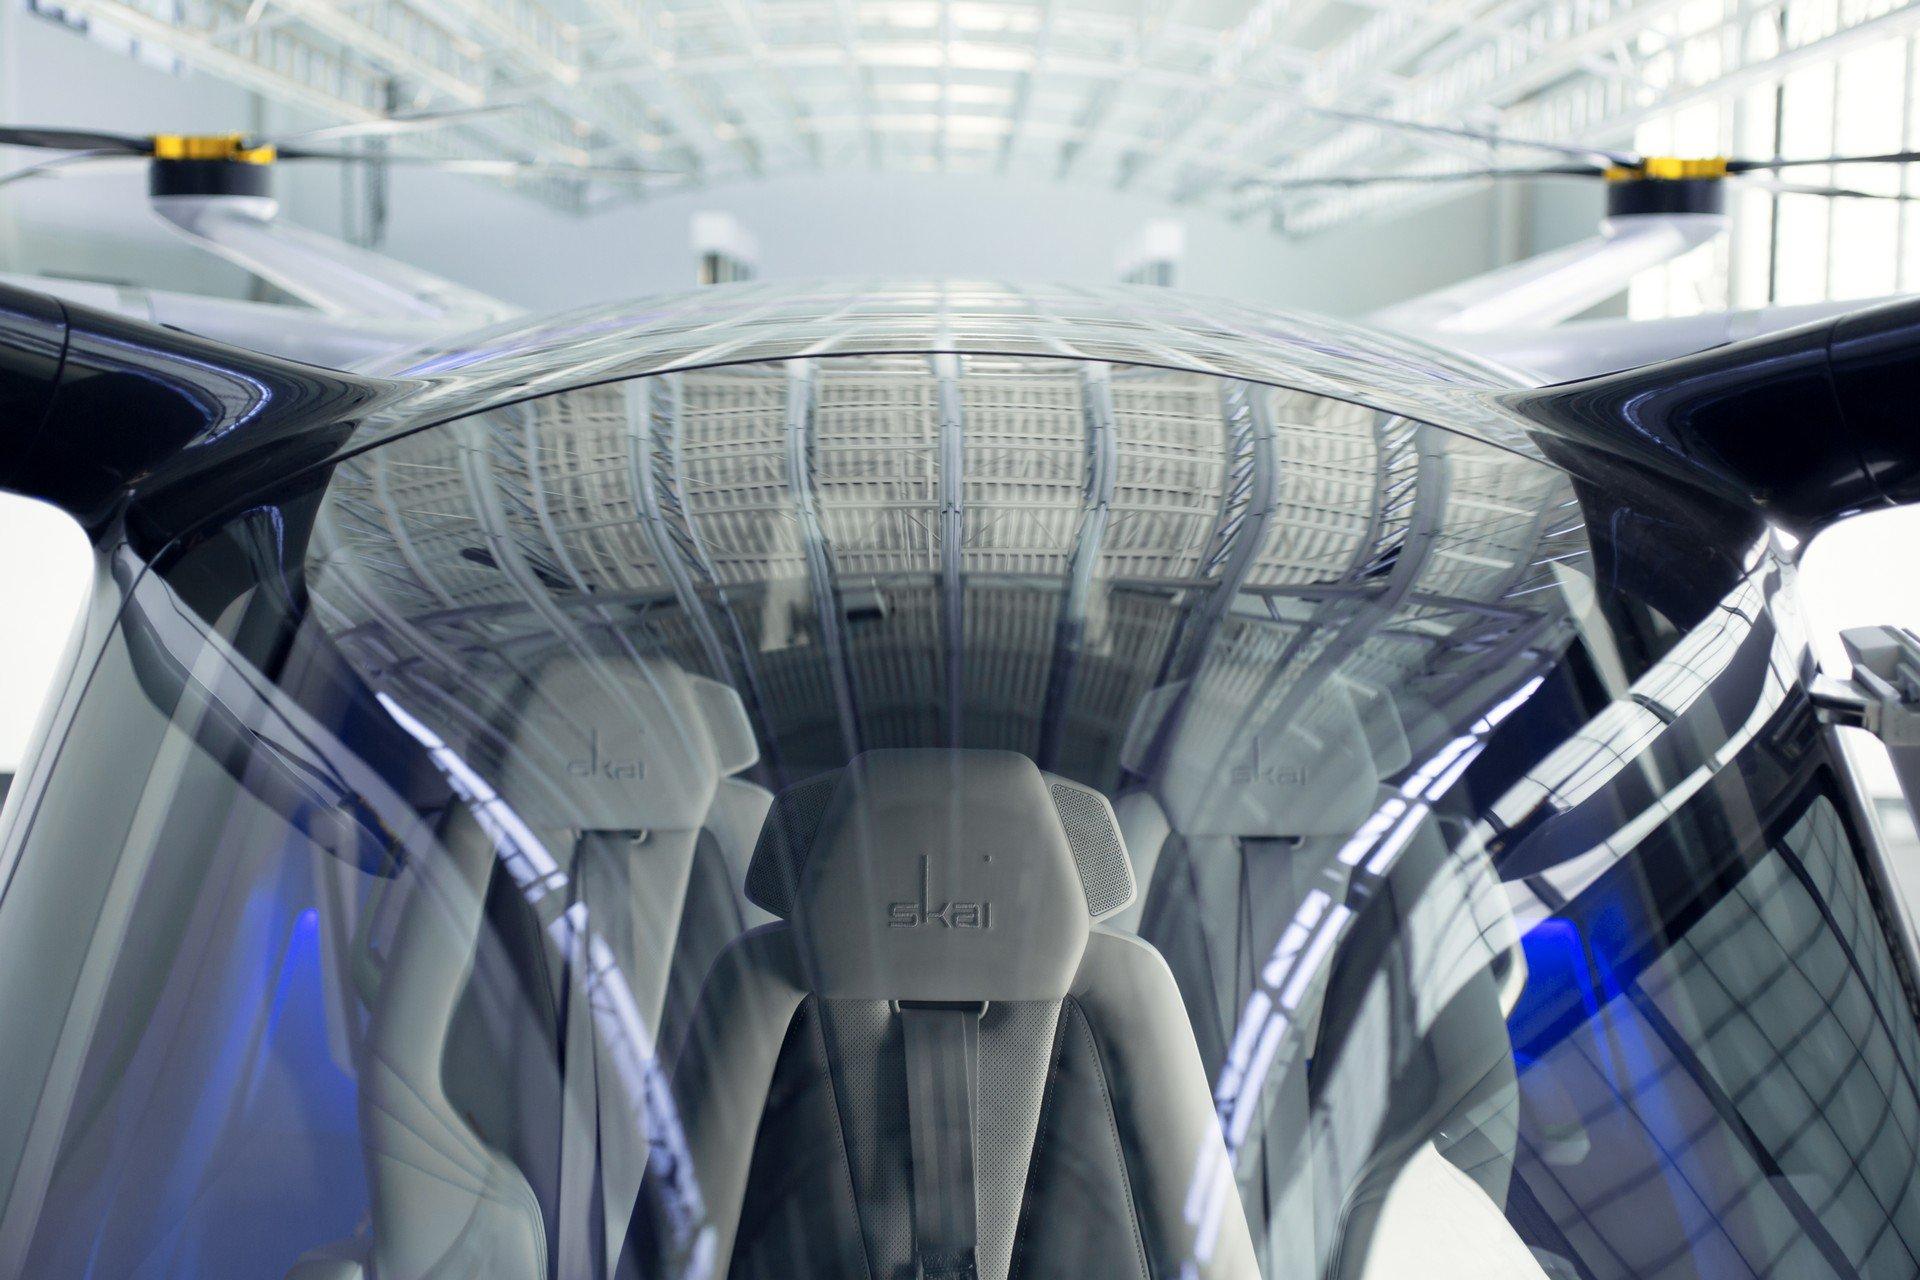 Alakai-Technologies-Skai-flying-car-9